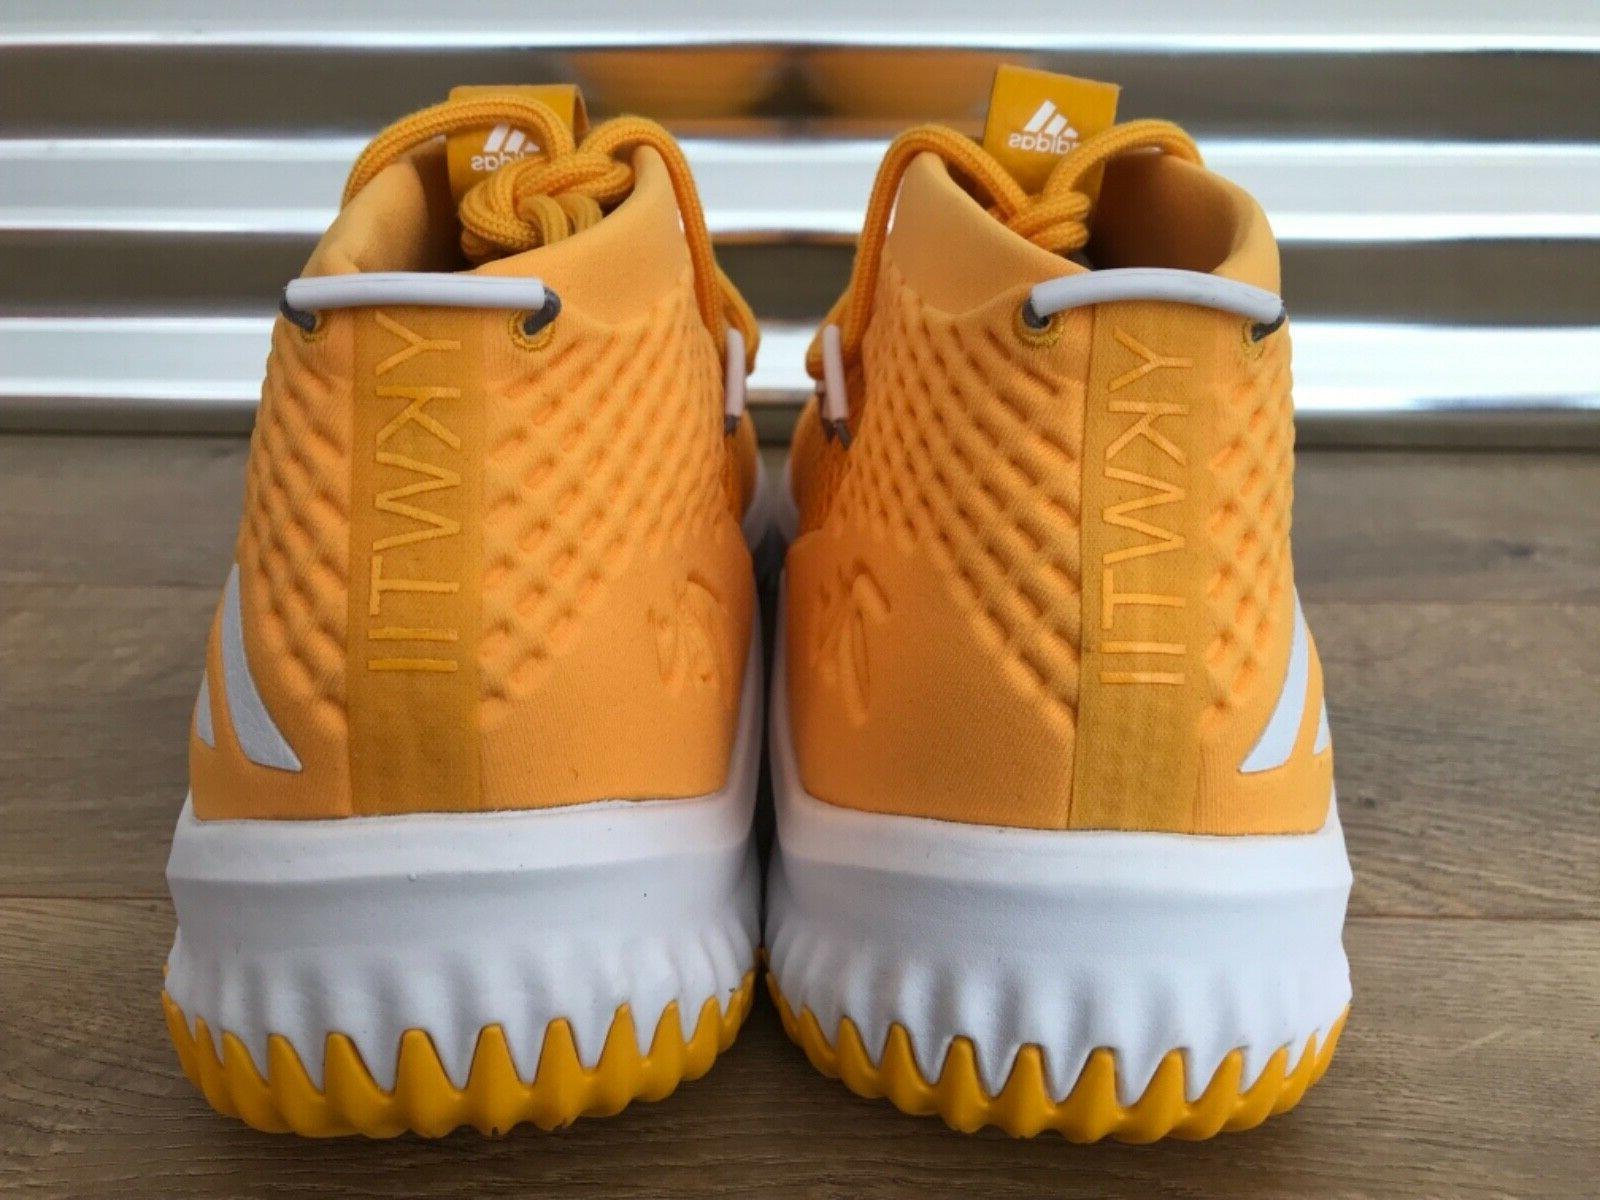 Adidas 4 NBA Basketball Gold White NIB